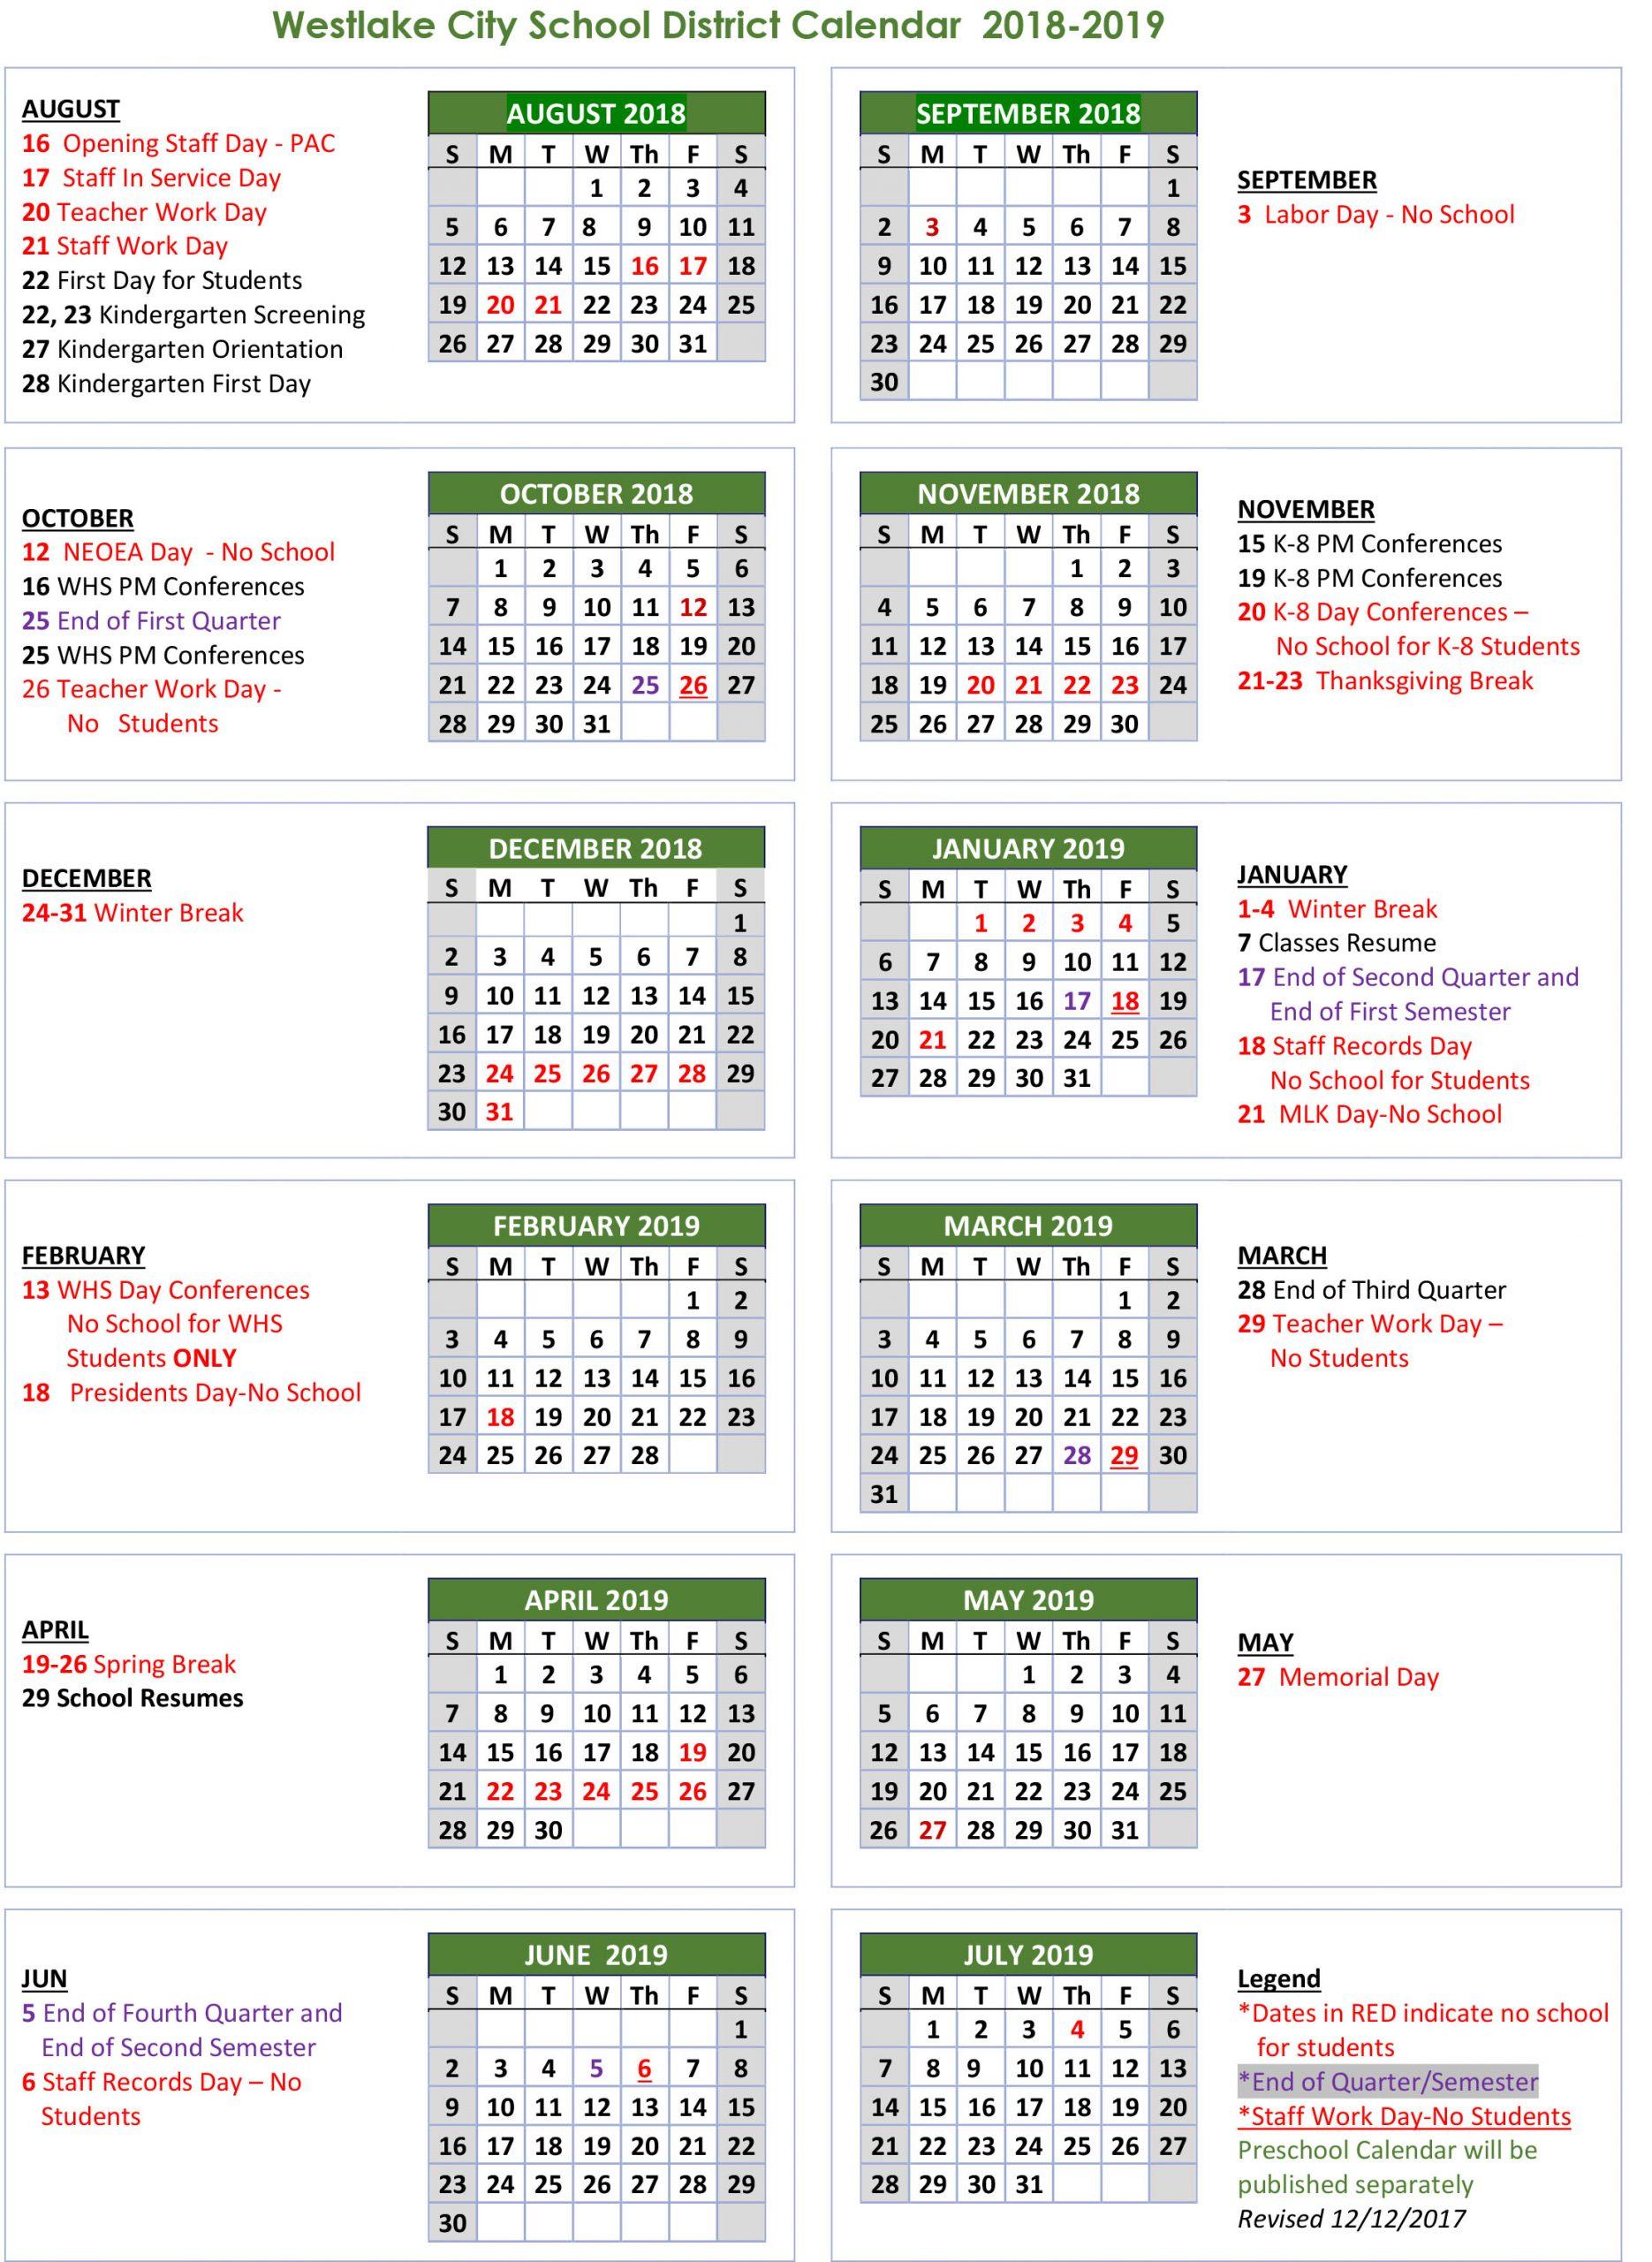 Lee County School Calendar 2020 17   Exam Calendar Intended For Boyertown School District Calendar 2020 17